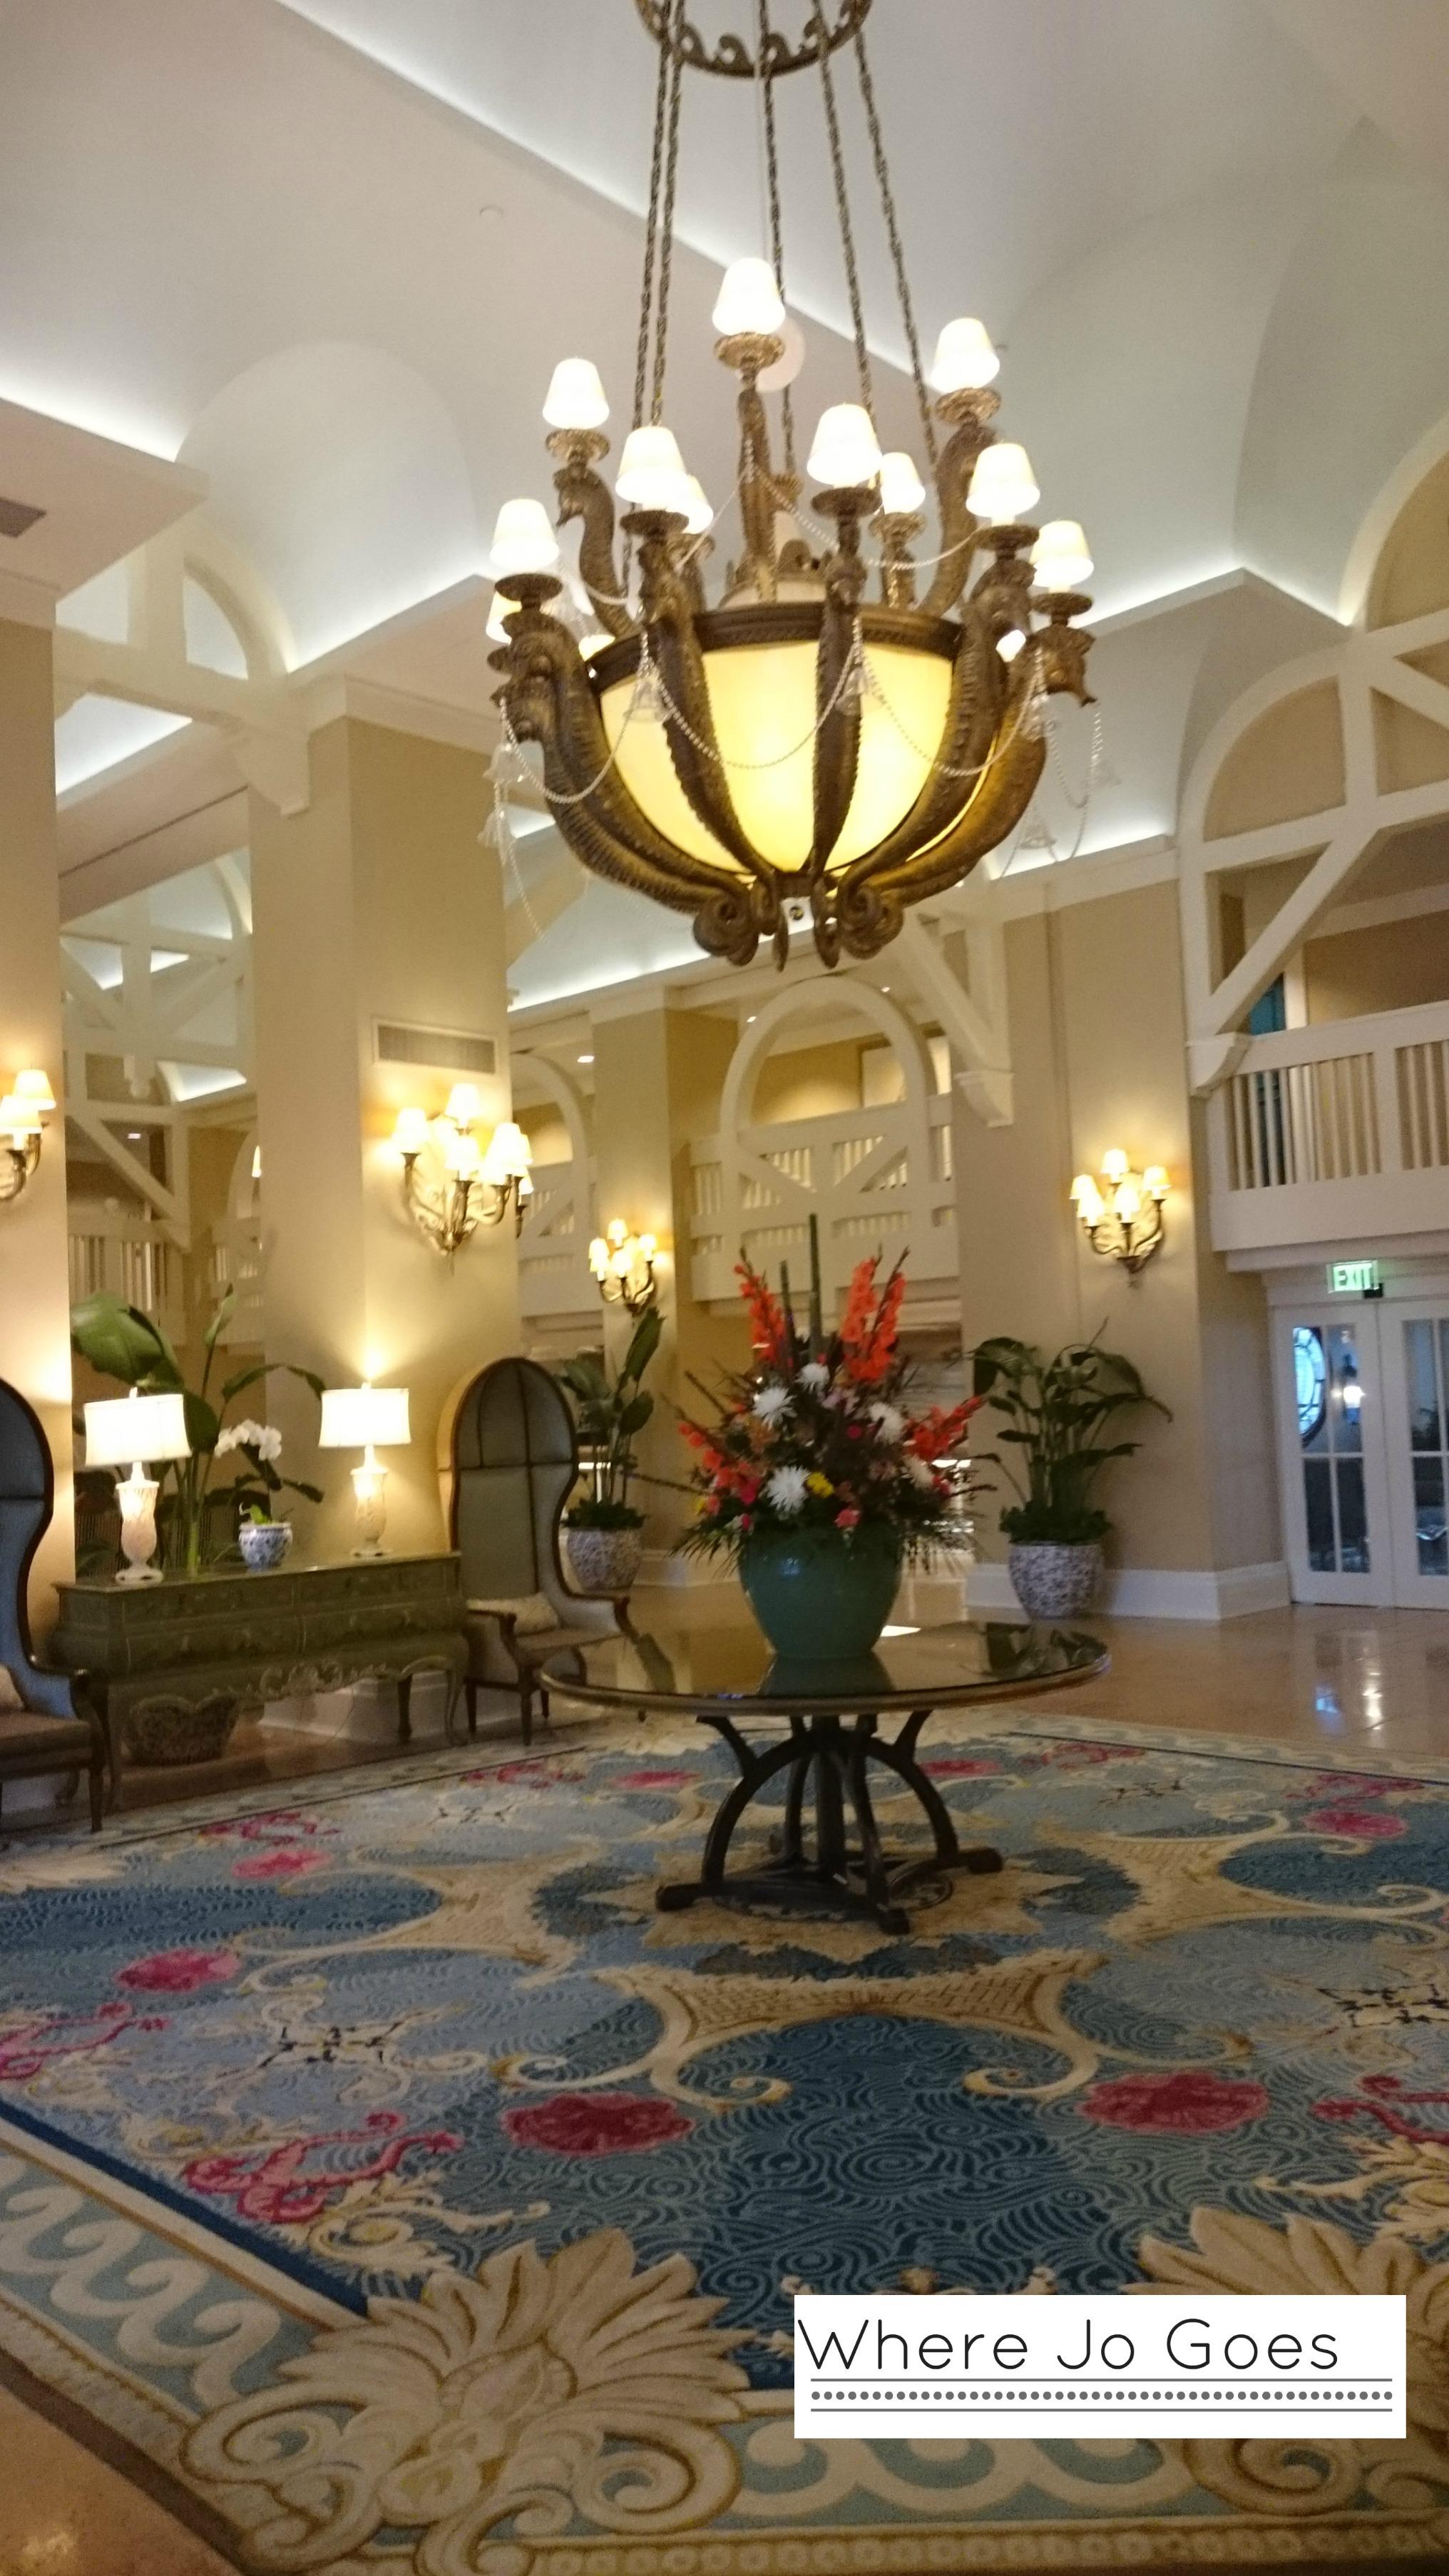 Beach Club Resort, Disneyworld, Orlando Florida